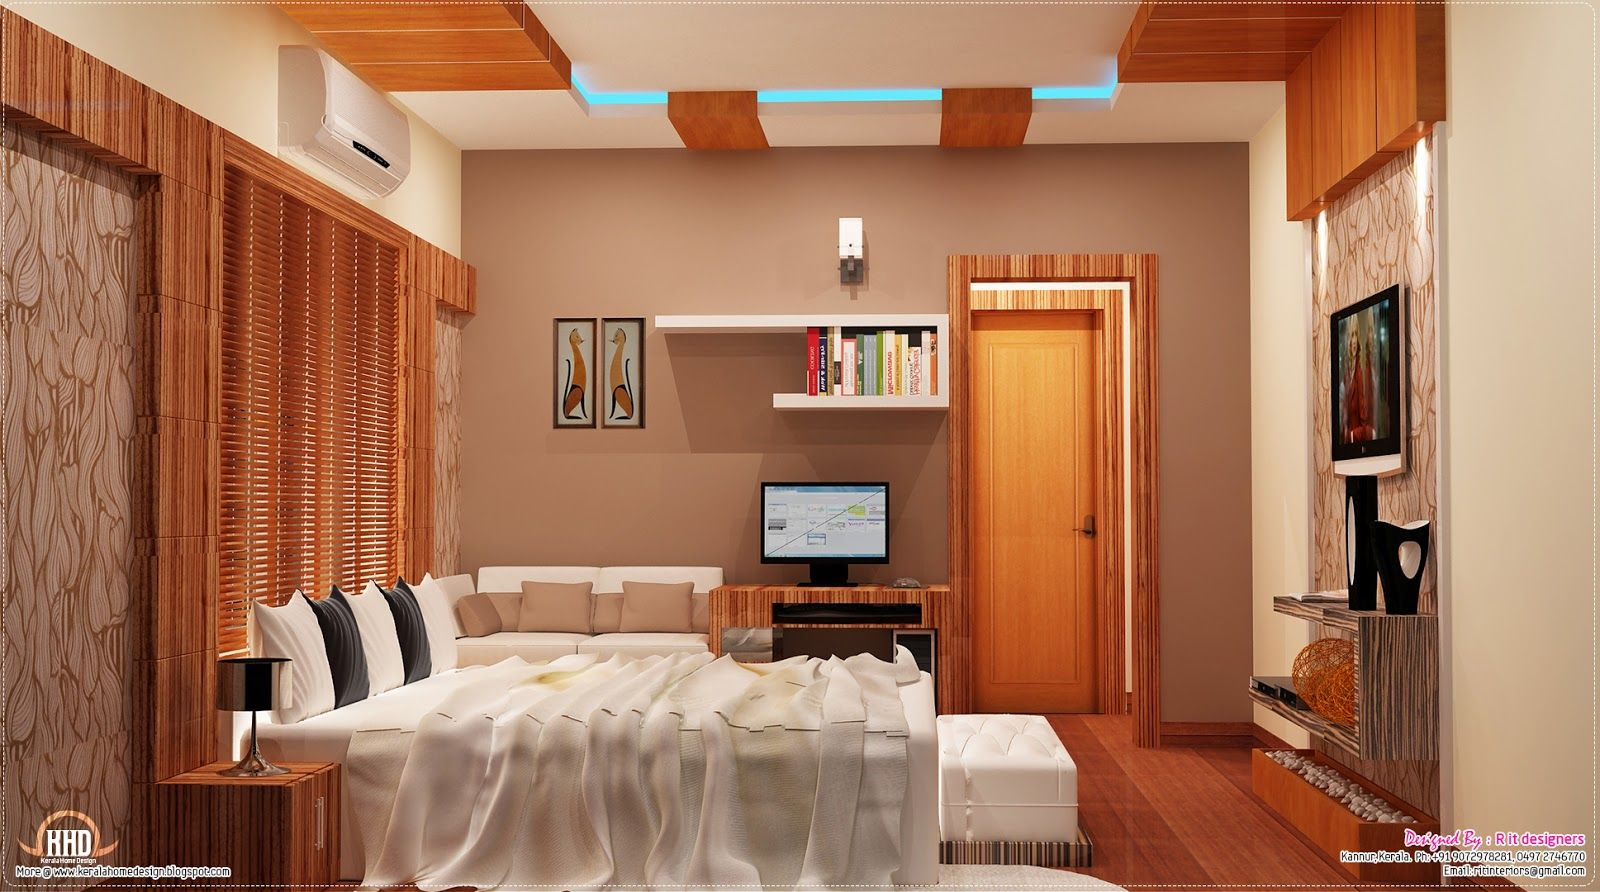 Fyi  bedroom house sq feet kerala home with interior designs also pathologyandhistology pinterest rh